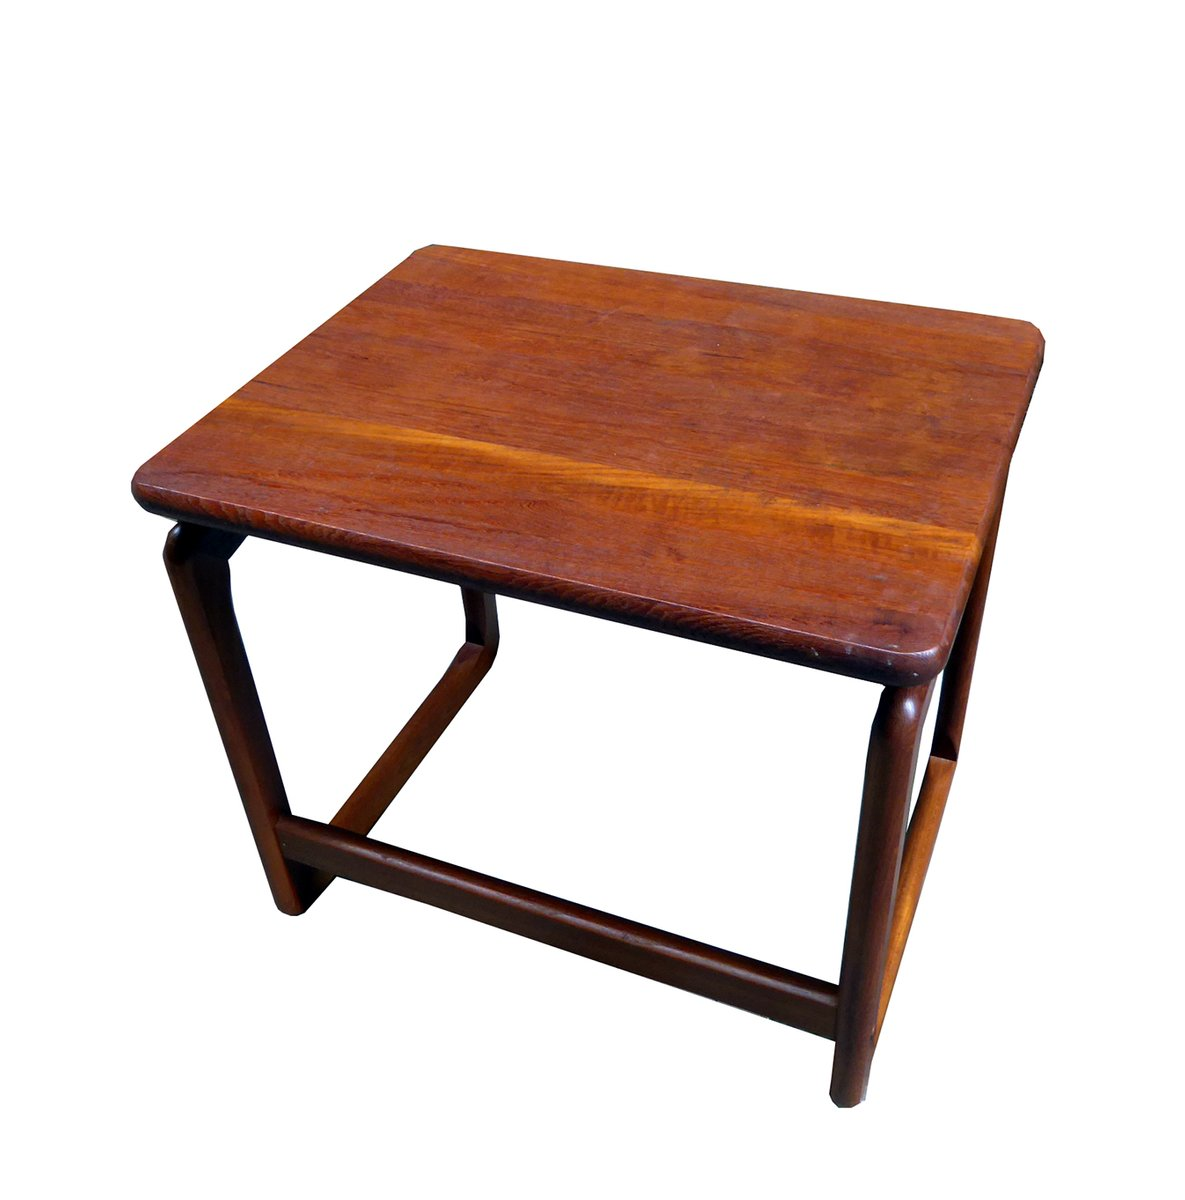 Retro Style Coffee Table Australia: Danish Teak Coffee Table, 1950s For Sale At Pamono